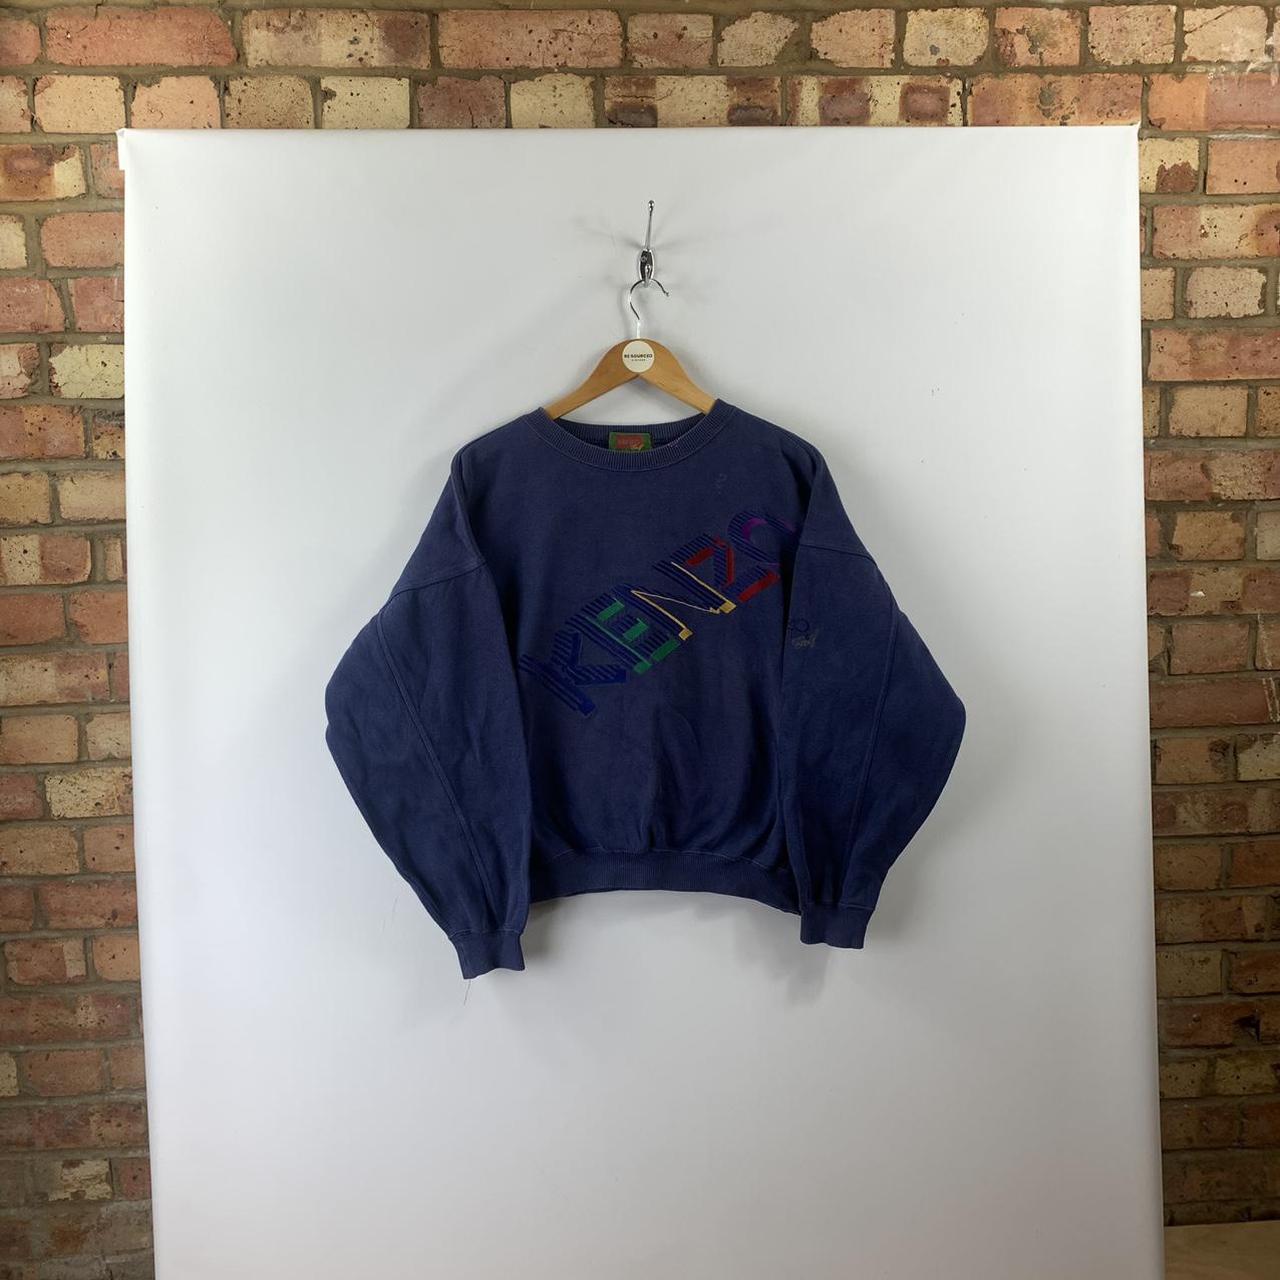 Product Image 1 - Vintage Kenzo crewneck jumper with